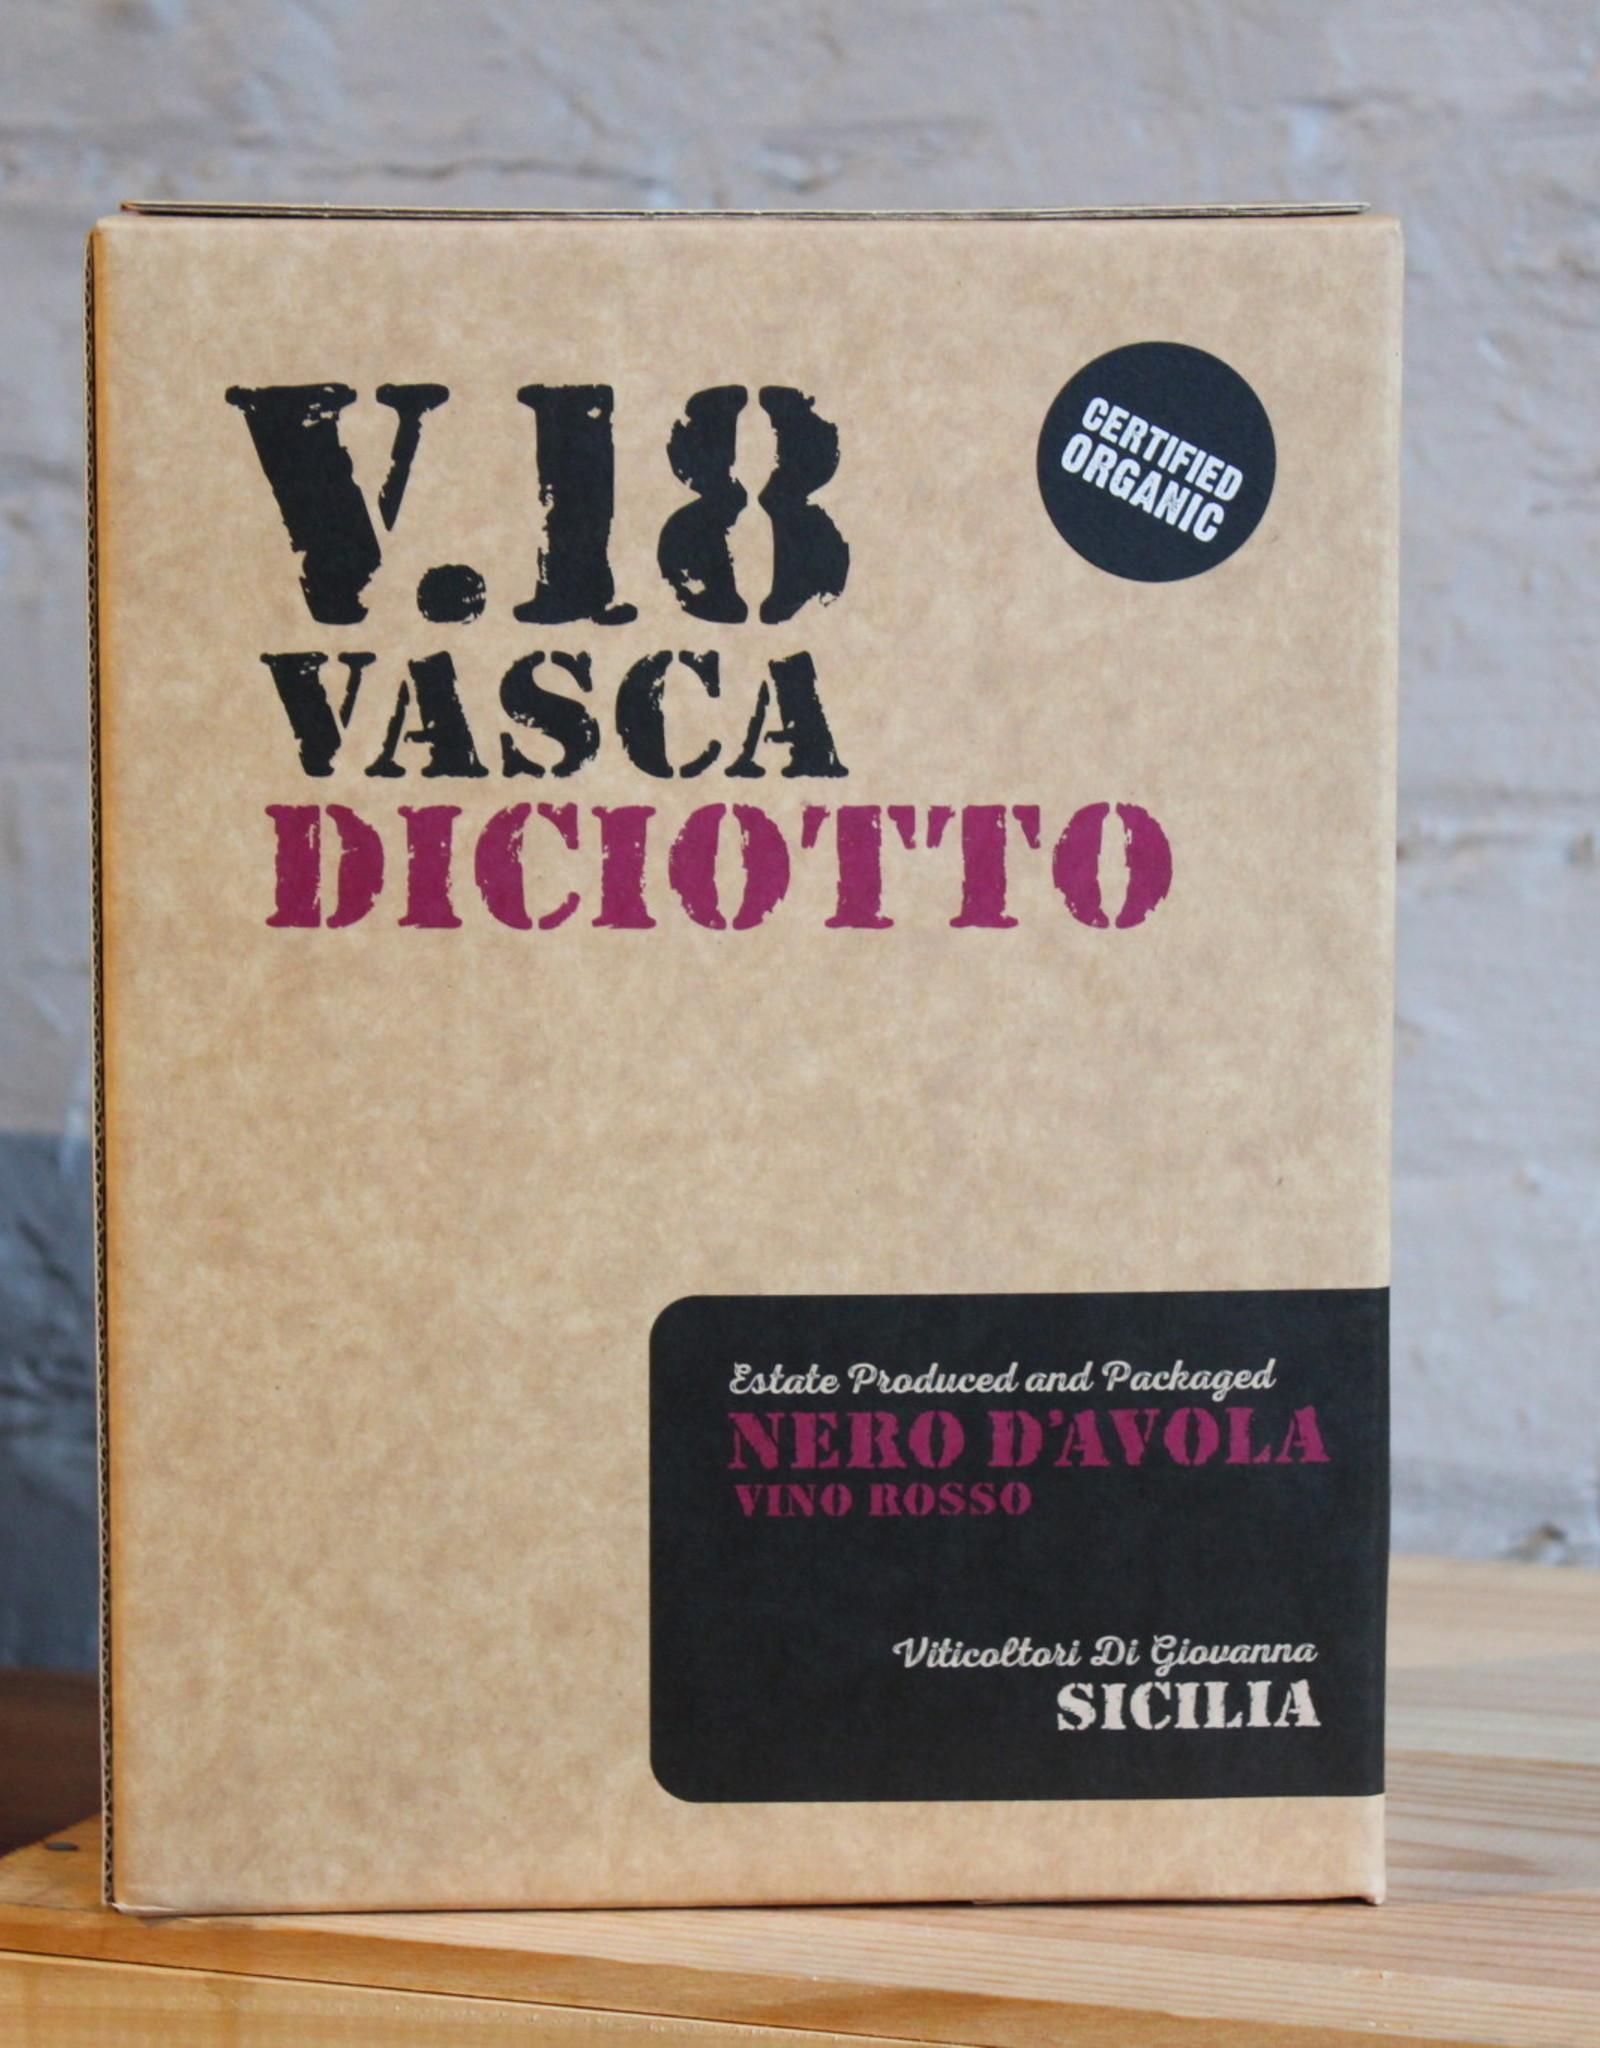 Wine 2019 Vasca Diciotto V.18 Nero d'Avola - Sicily, Italy (3Ltr Bag in a box)